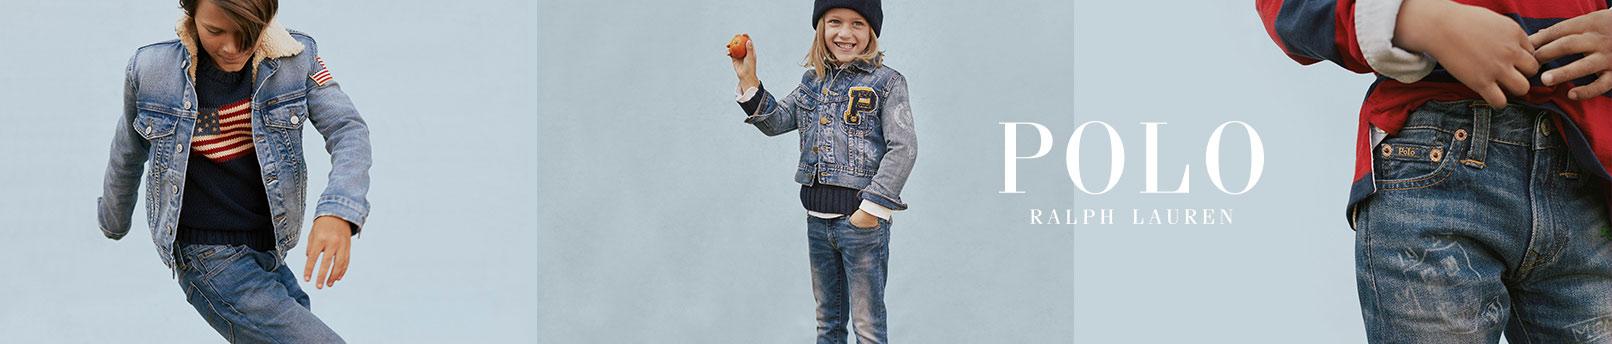 415b14752 Accessories | Barn | Nye accessories til barn på nett hos Zalando